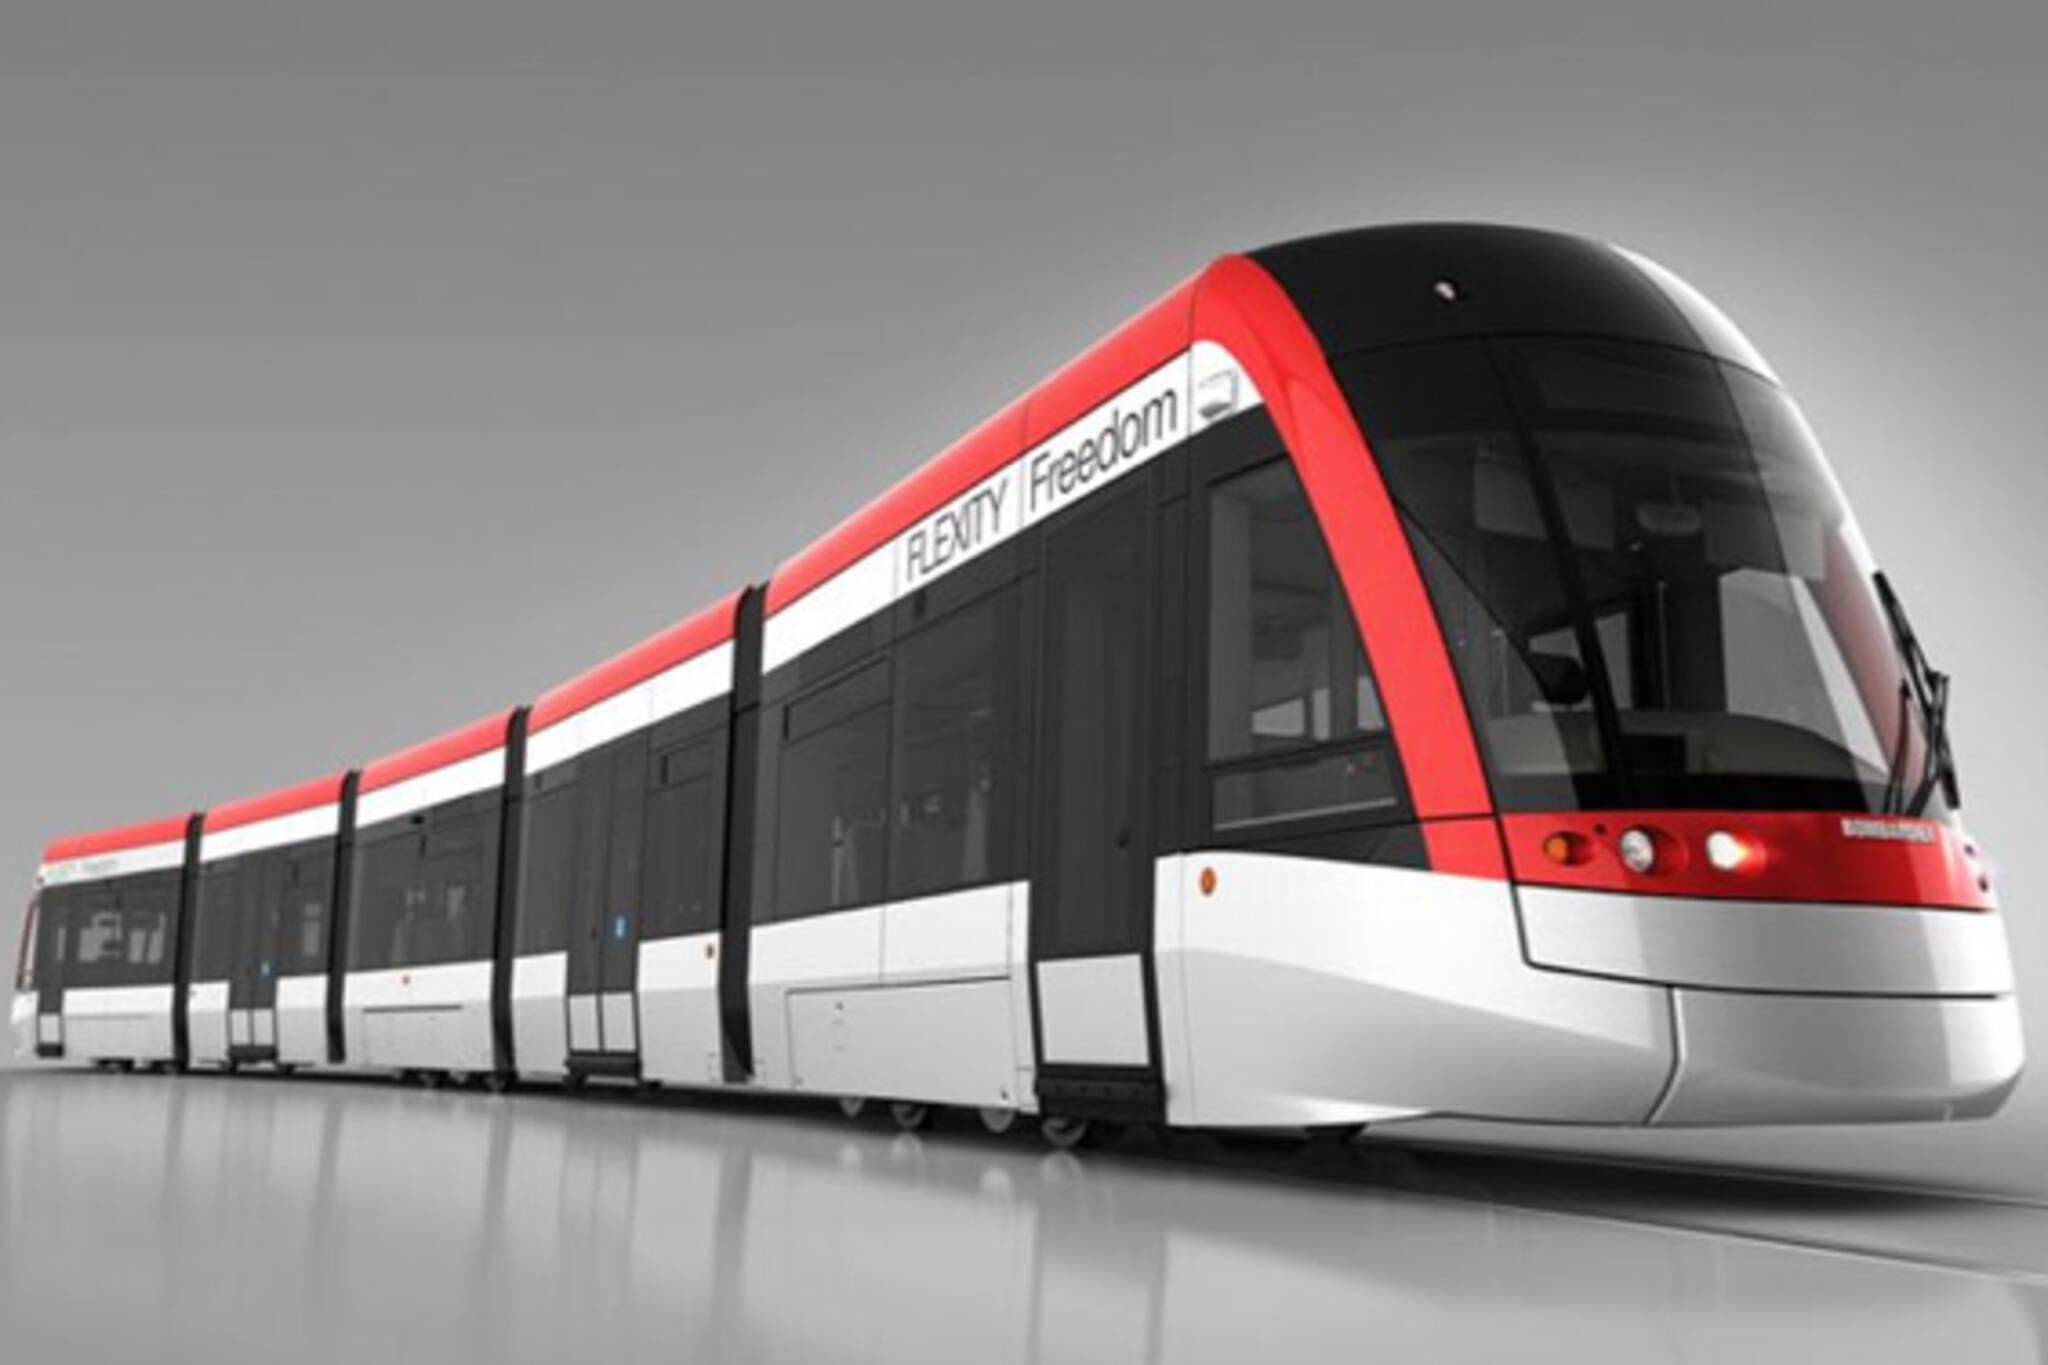 Transit City Toronto 2012